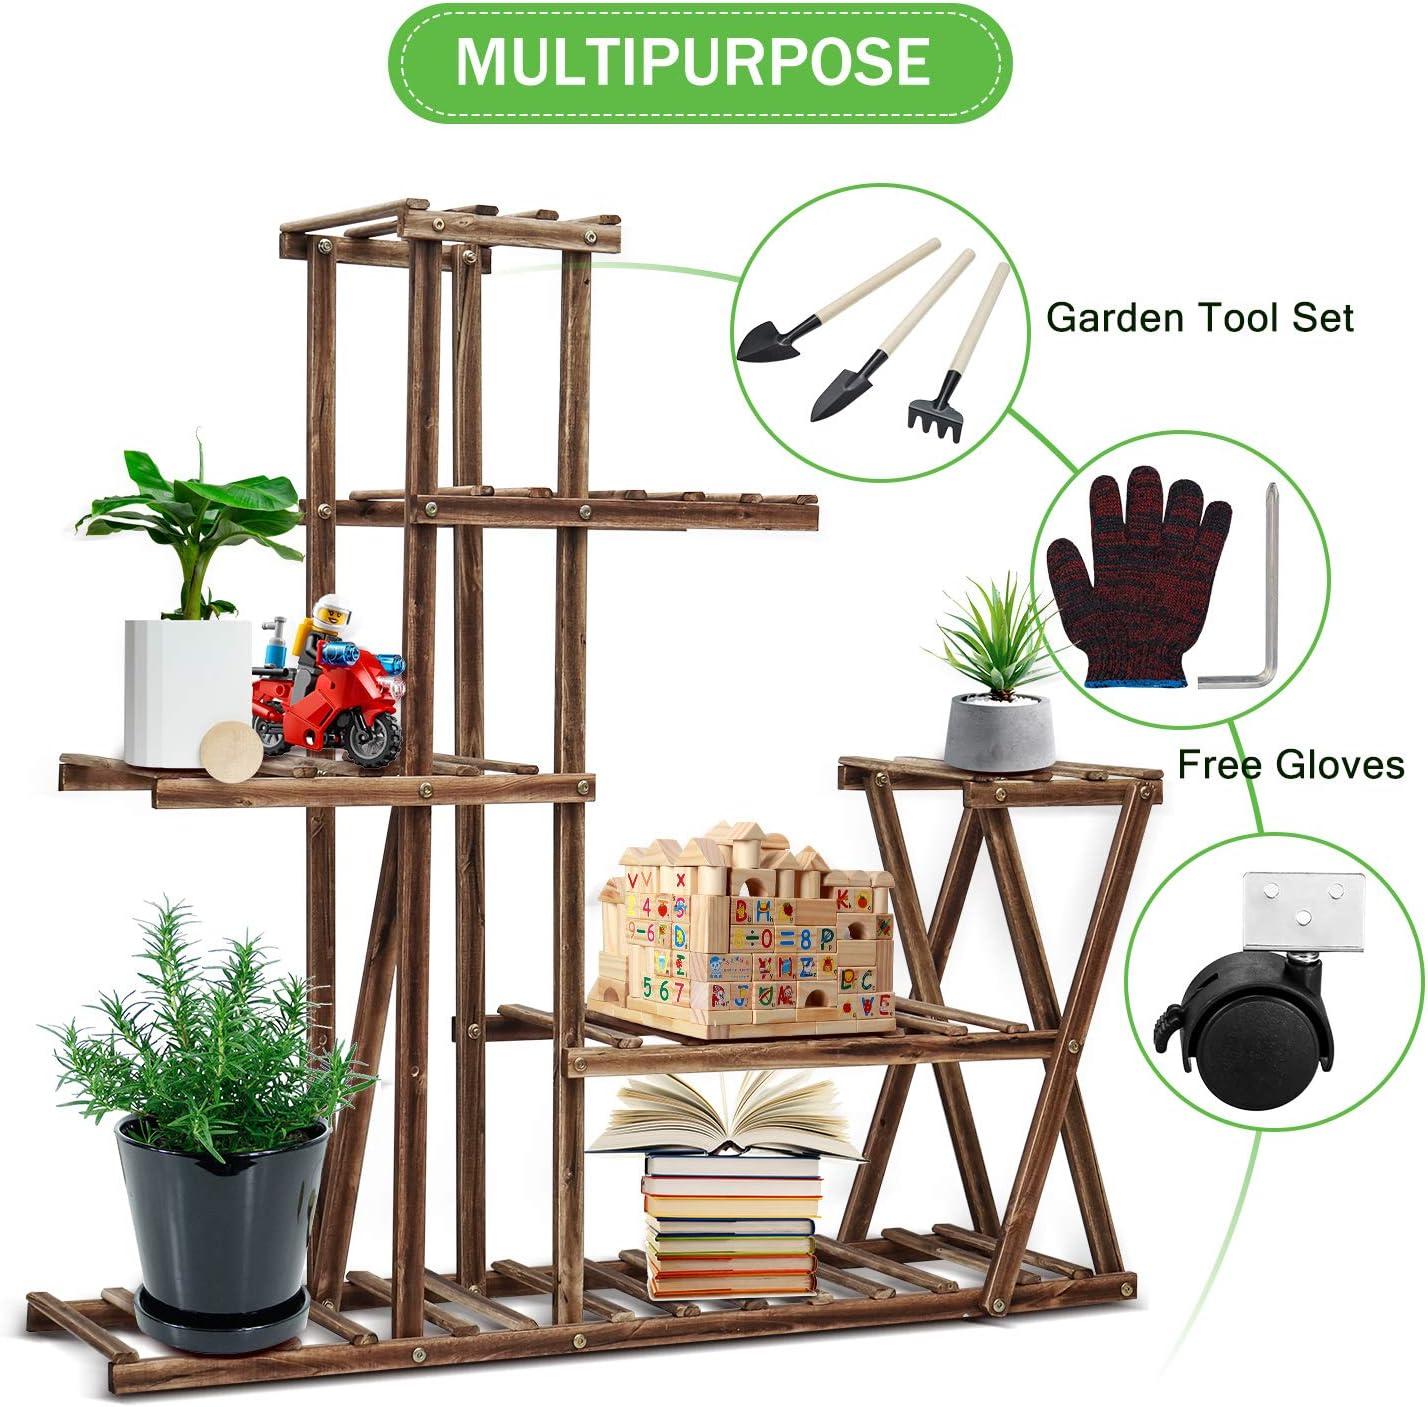 cfmour Wood Plant Stand Indoor Outdoor, Plant Display Multi Tier Flower  Shelves Stands, Garden Plant Shelf Rack Holder in Corner Living Room  Balcony ...